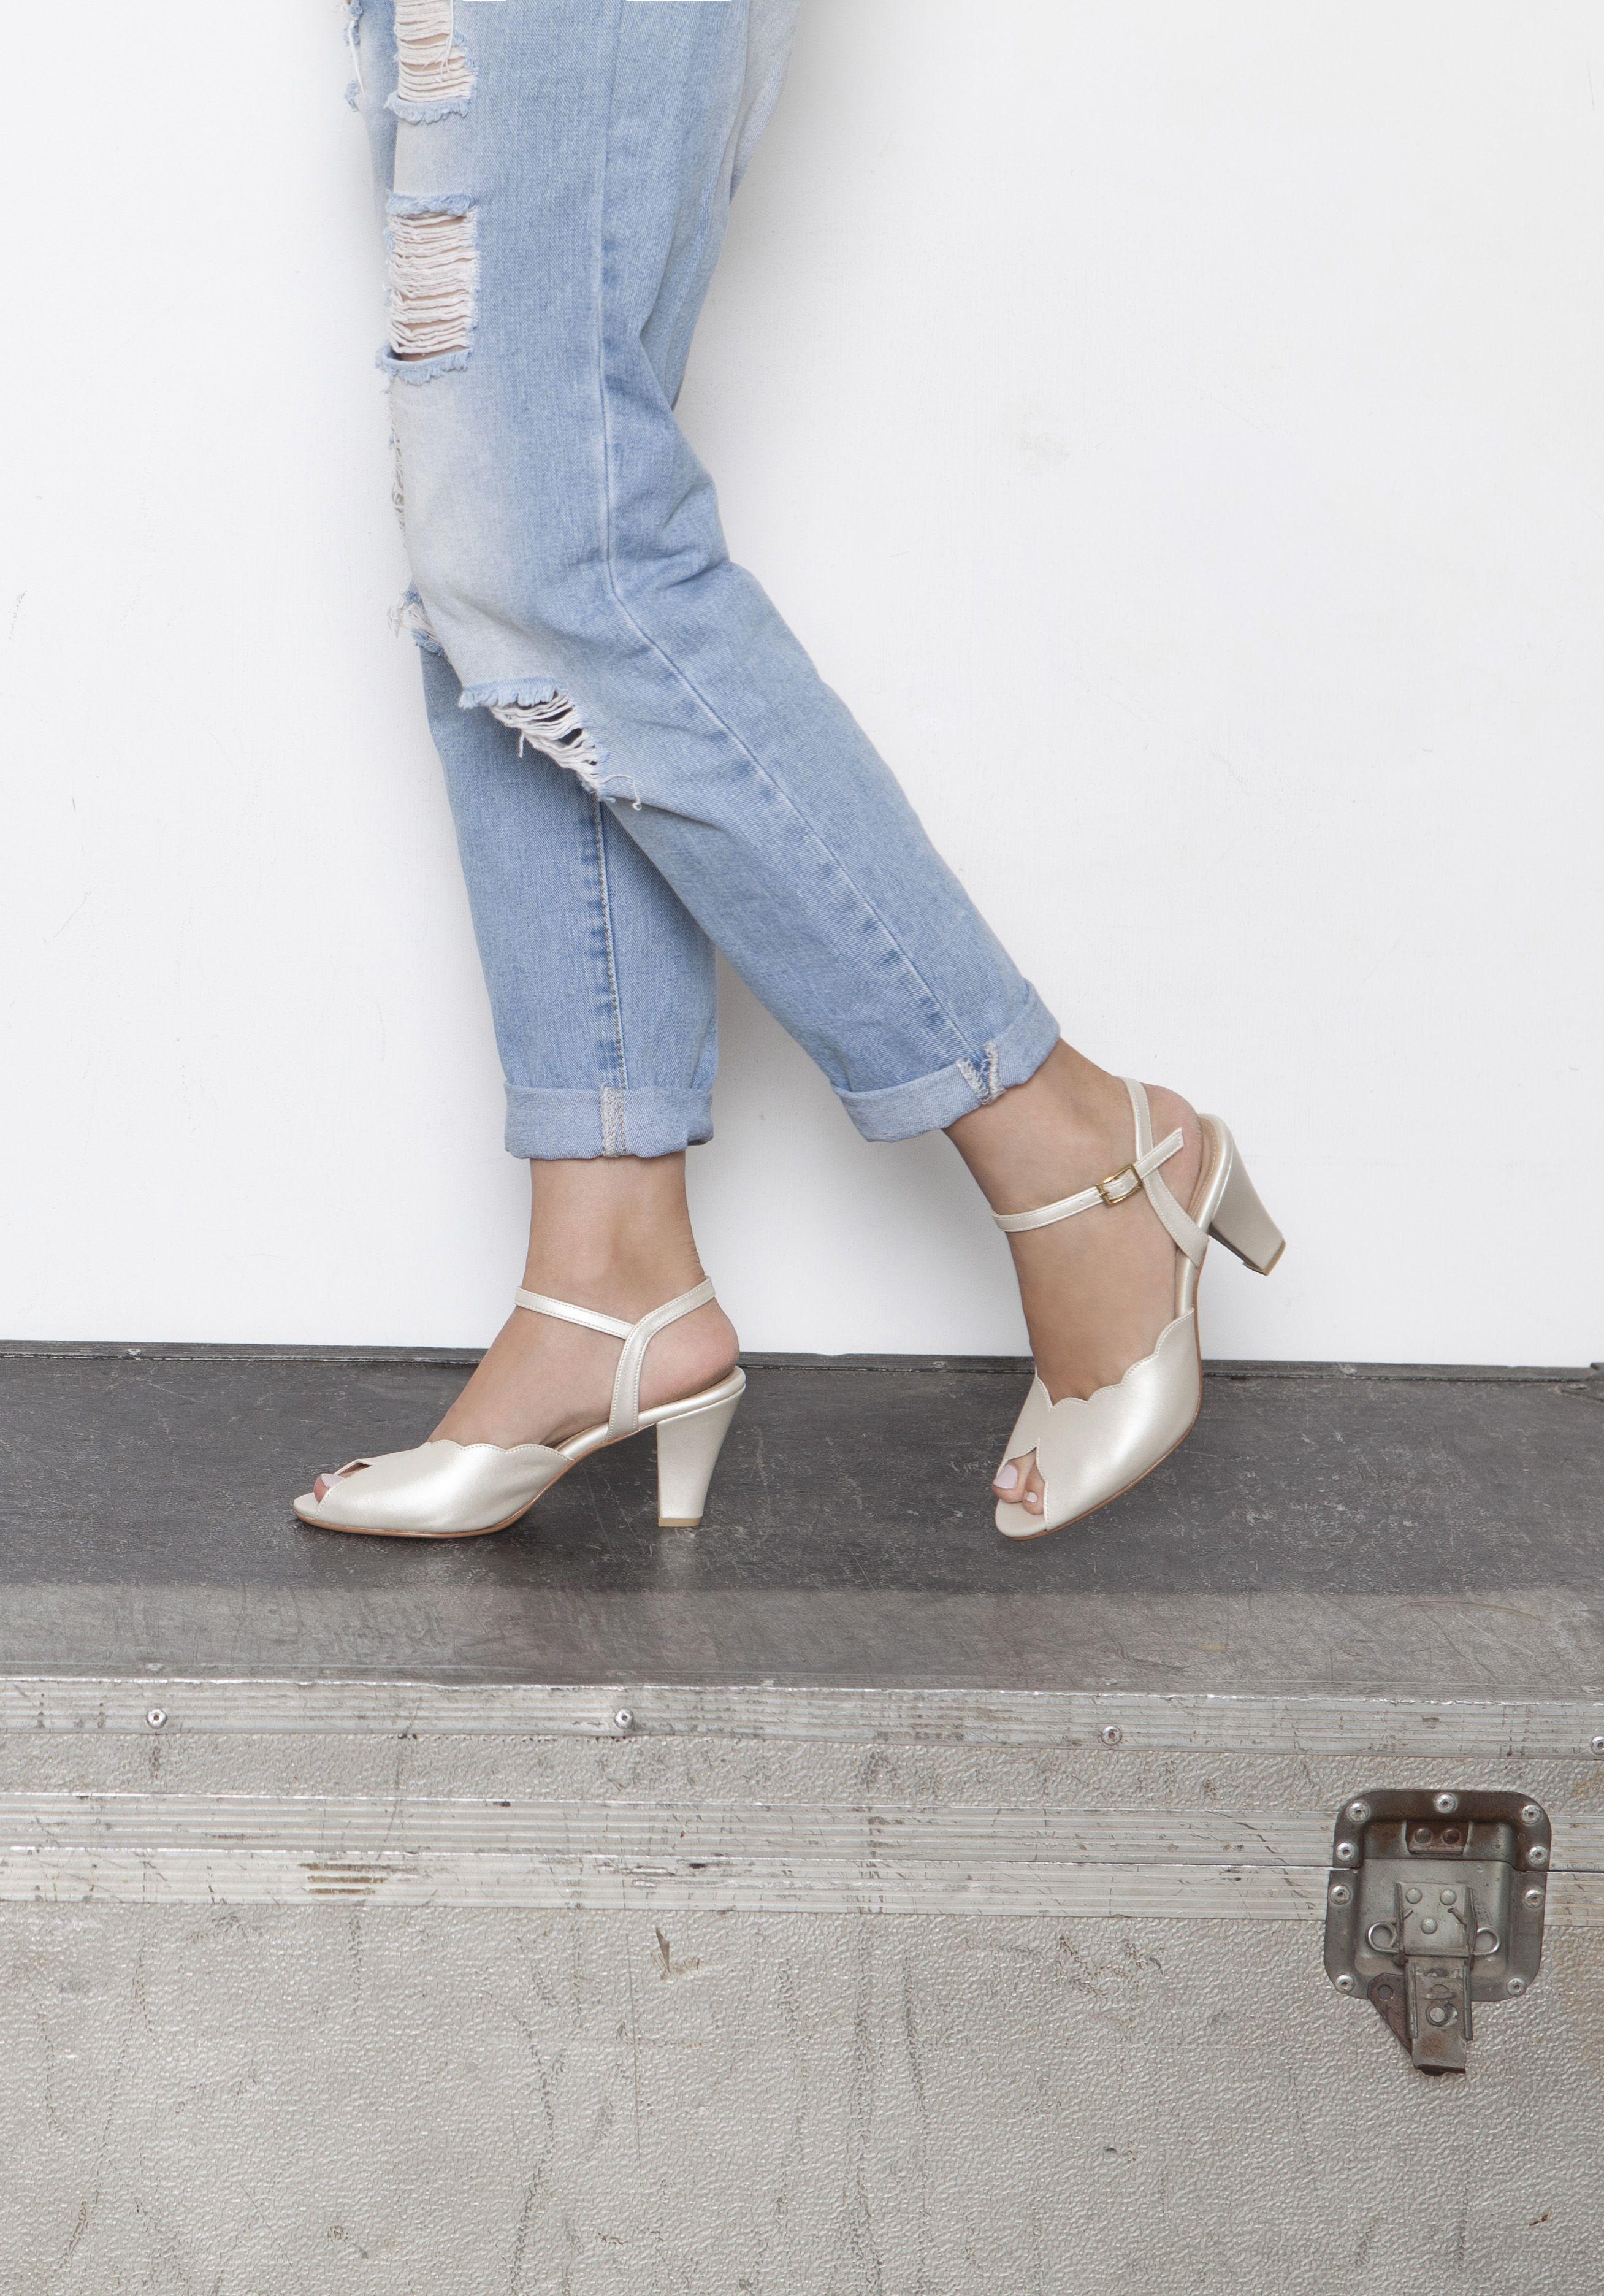 c9aae4f4f404e Adina Vegan Bridal Shoes, Ivory High Heel Wedding Sandal with a ...